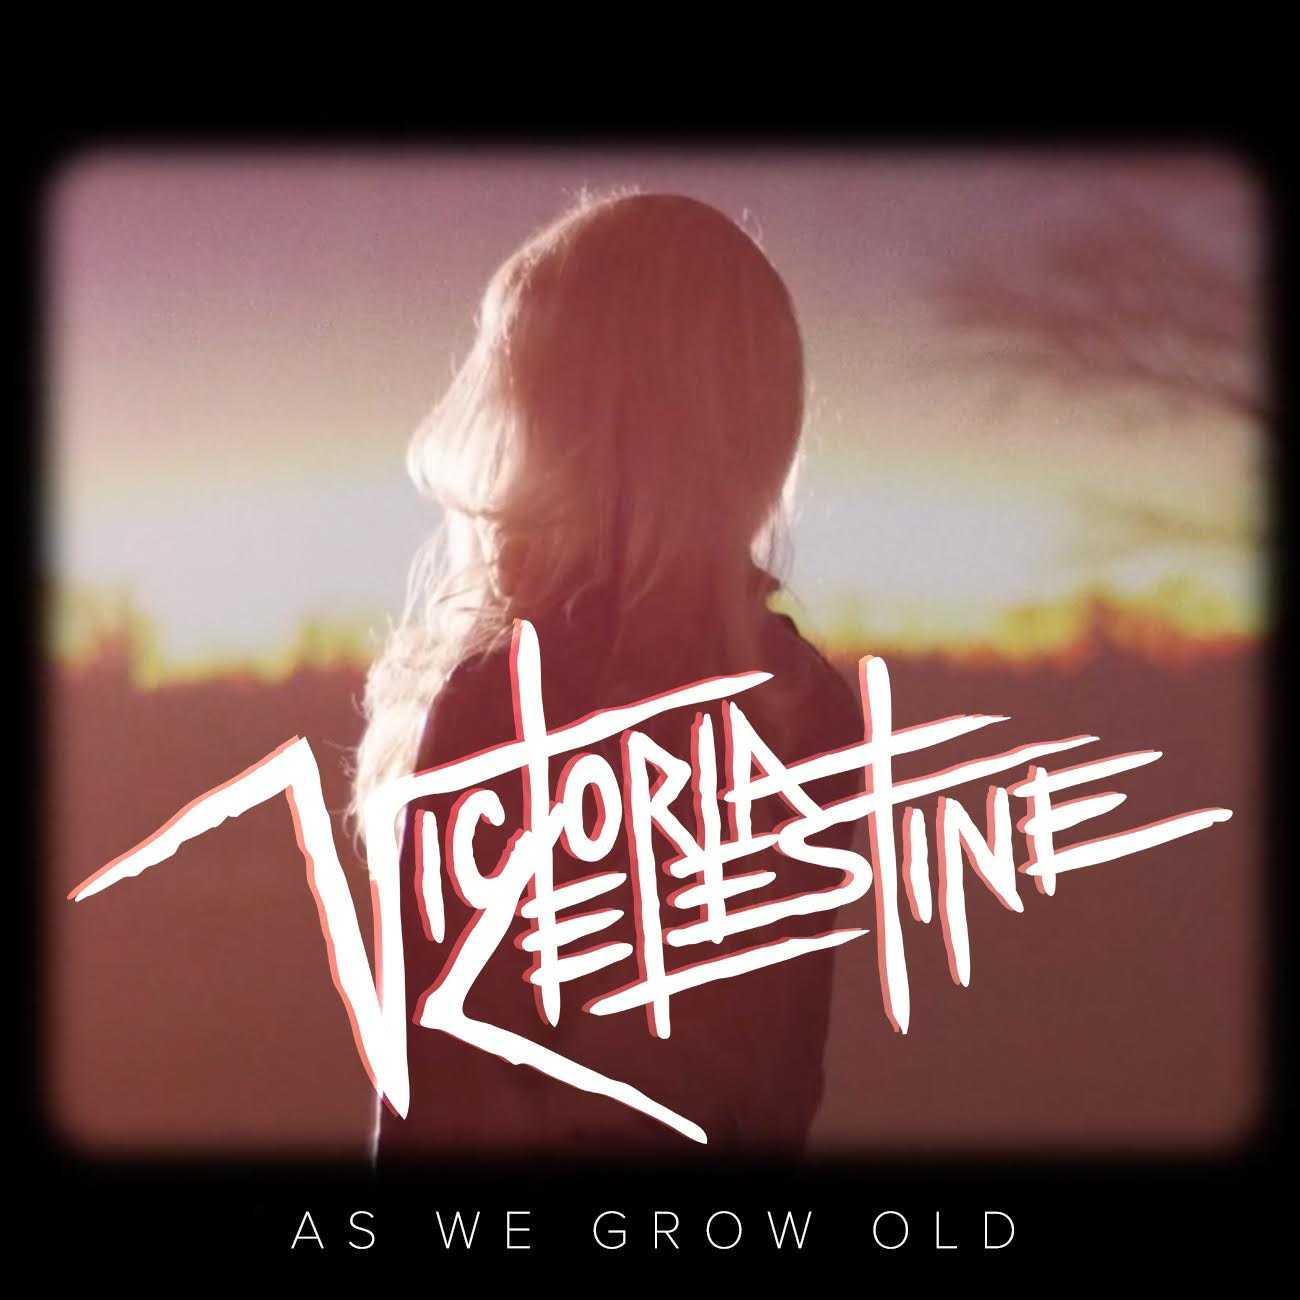 Exclusive: Victoria Celestine Premieres